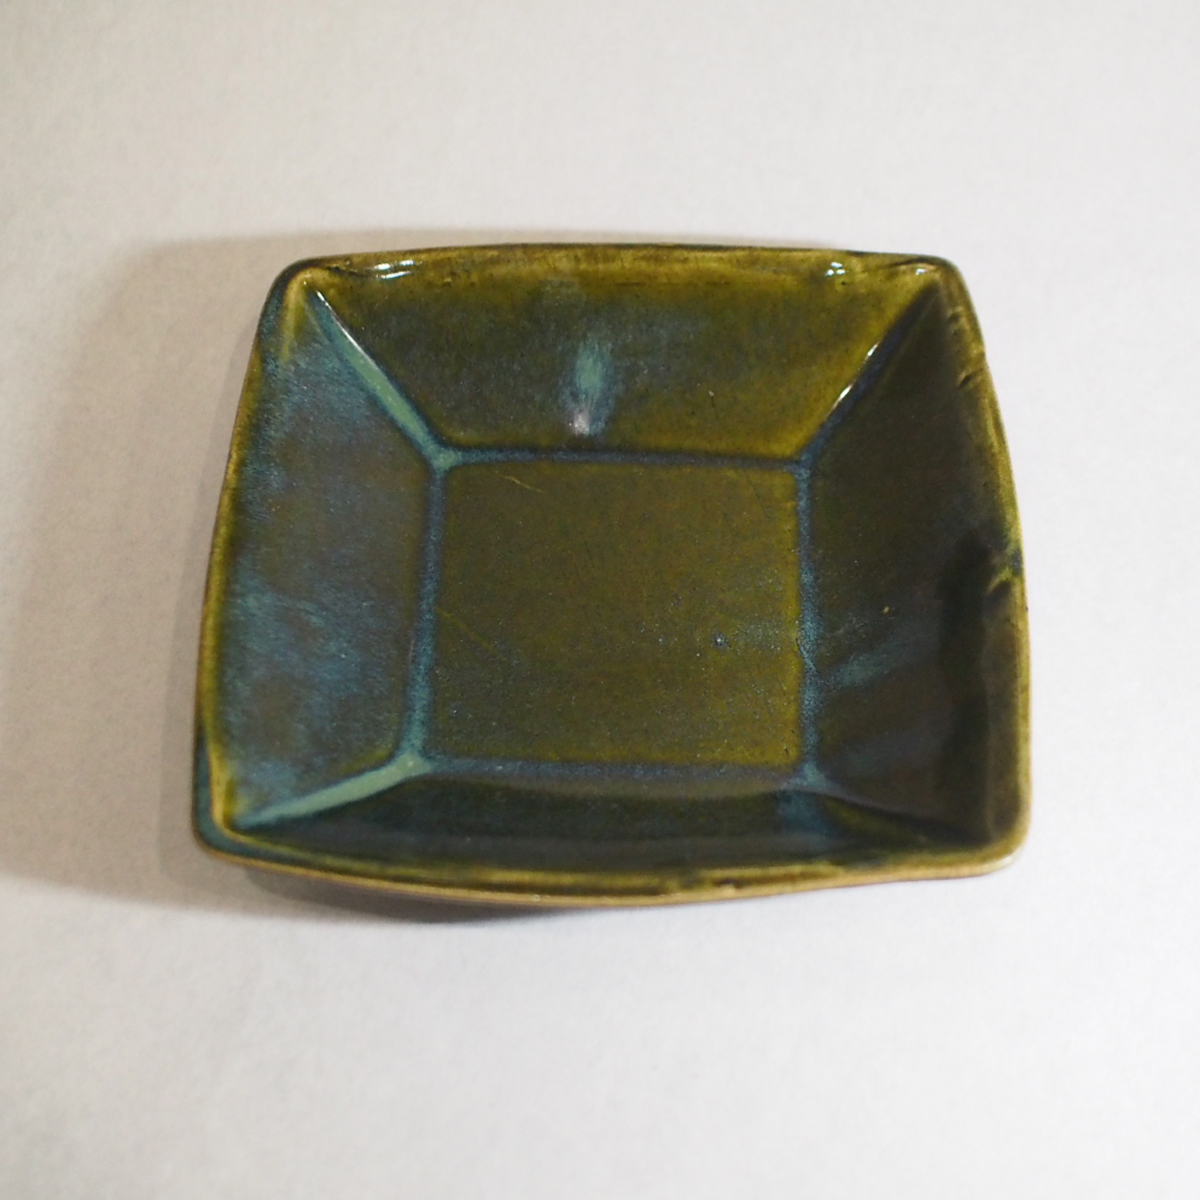 square bowl 四角の万能鉢の画像